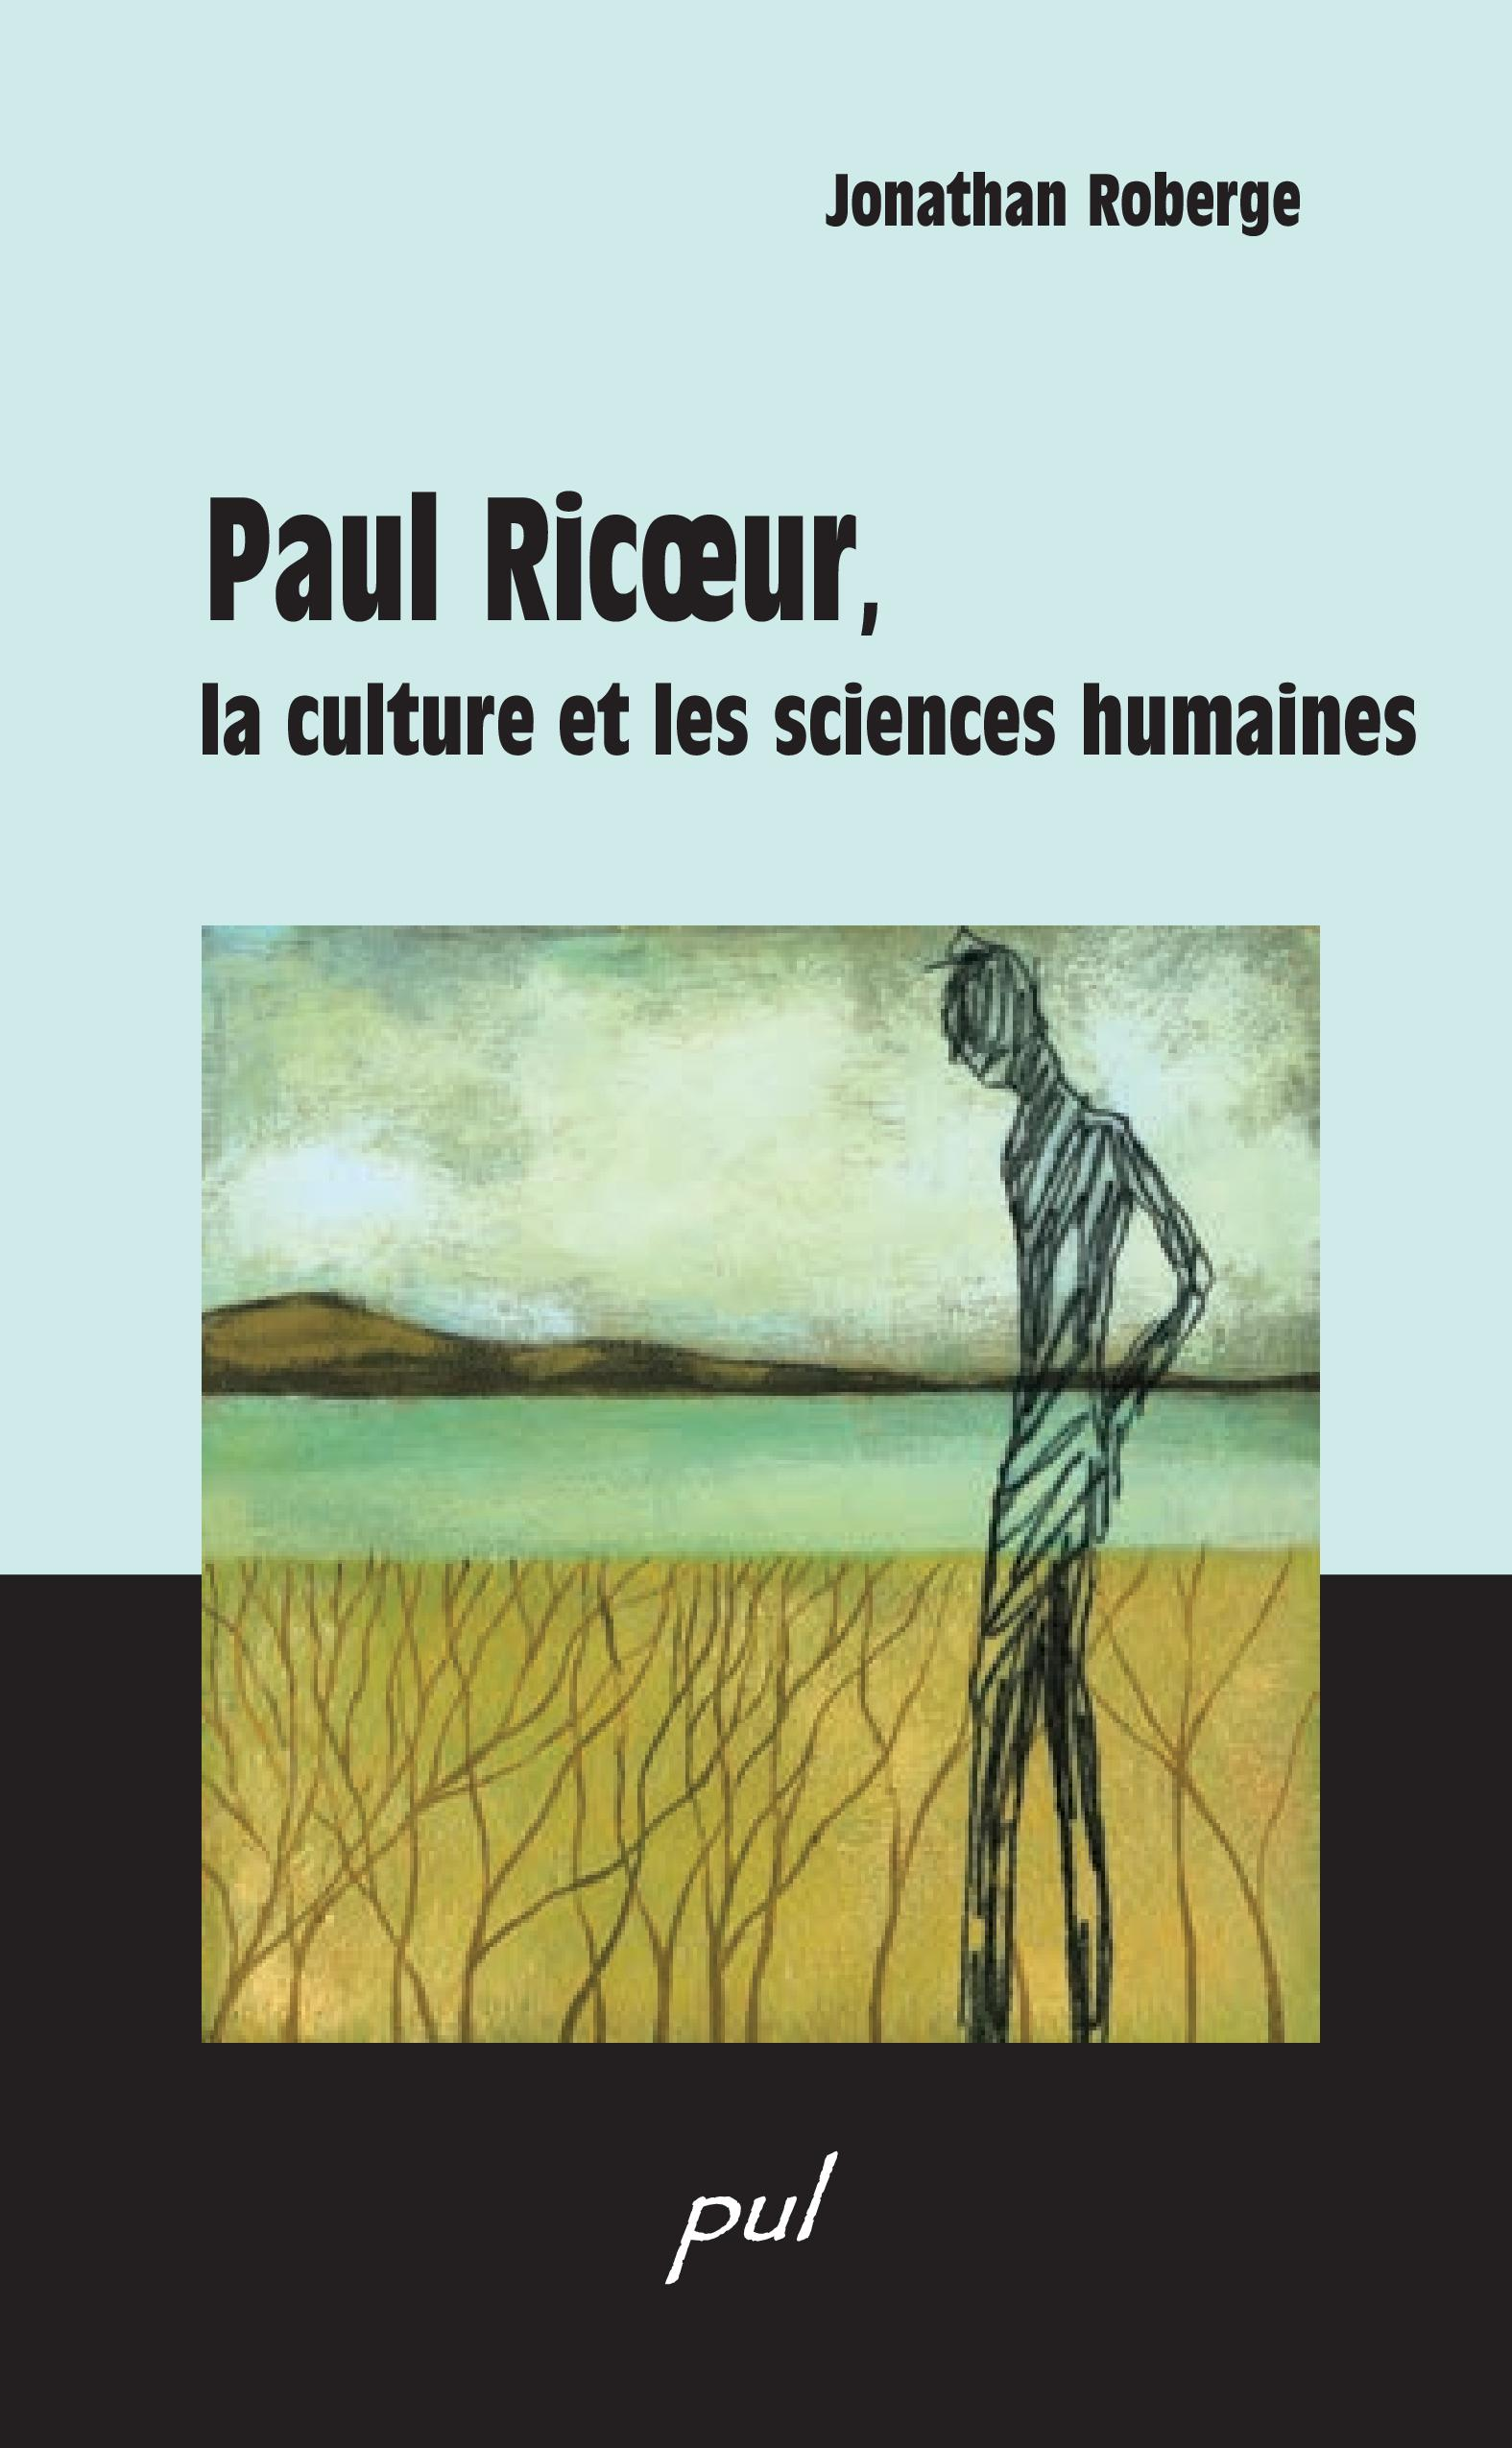 Paul Ricoeur, culture scienceshumaines